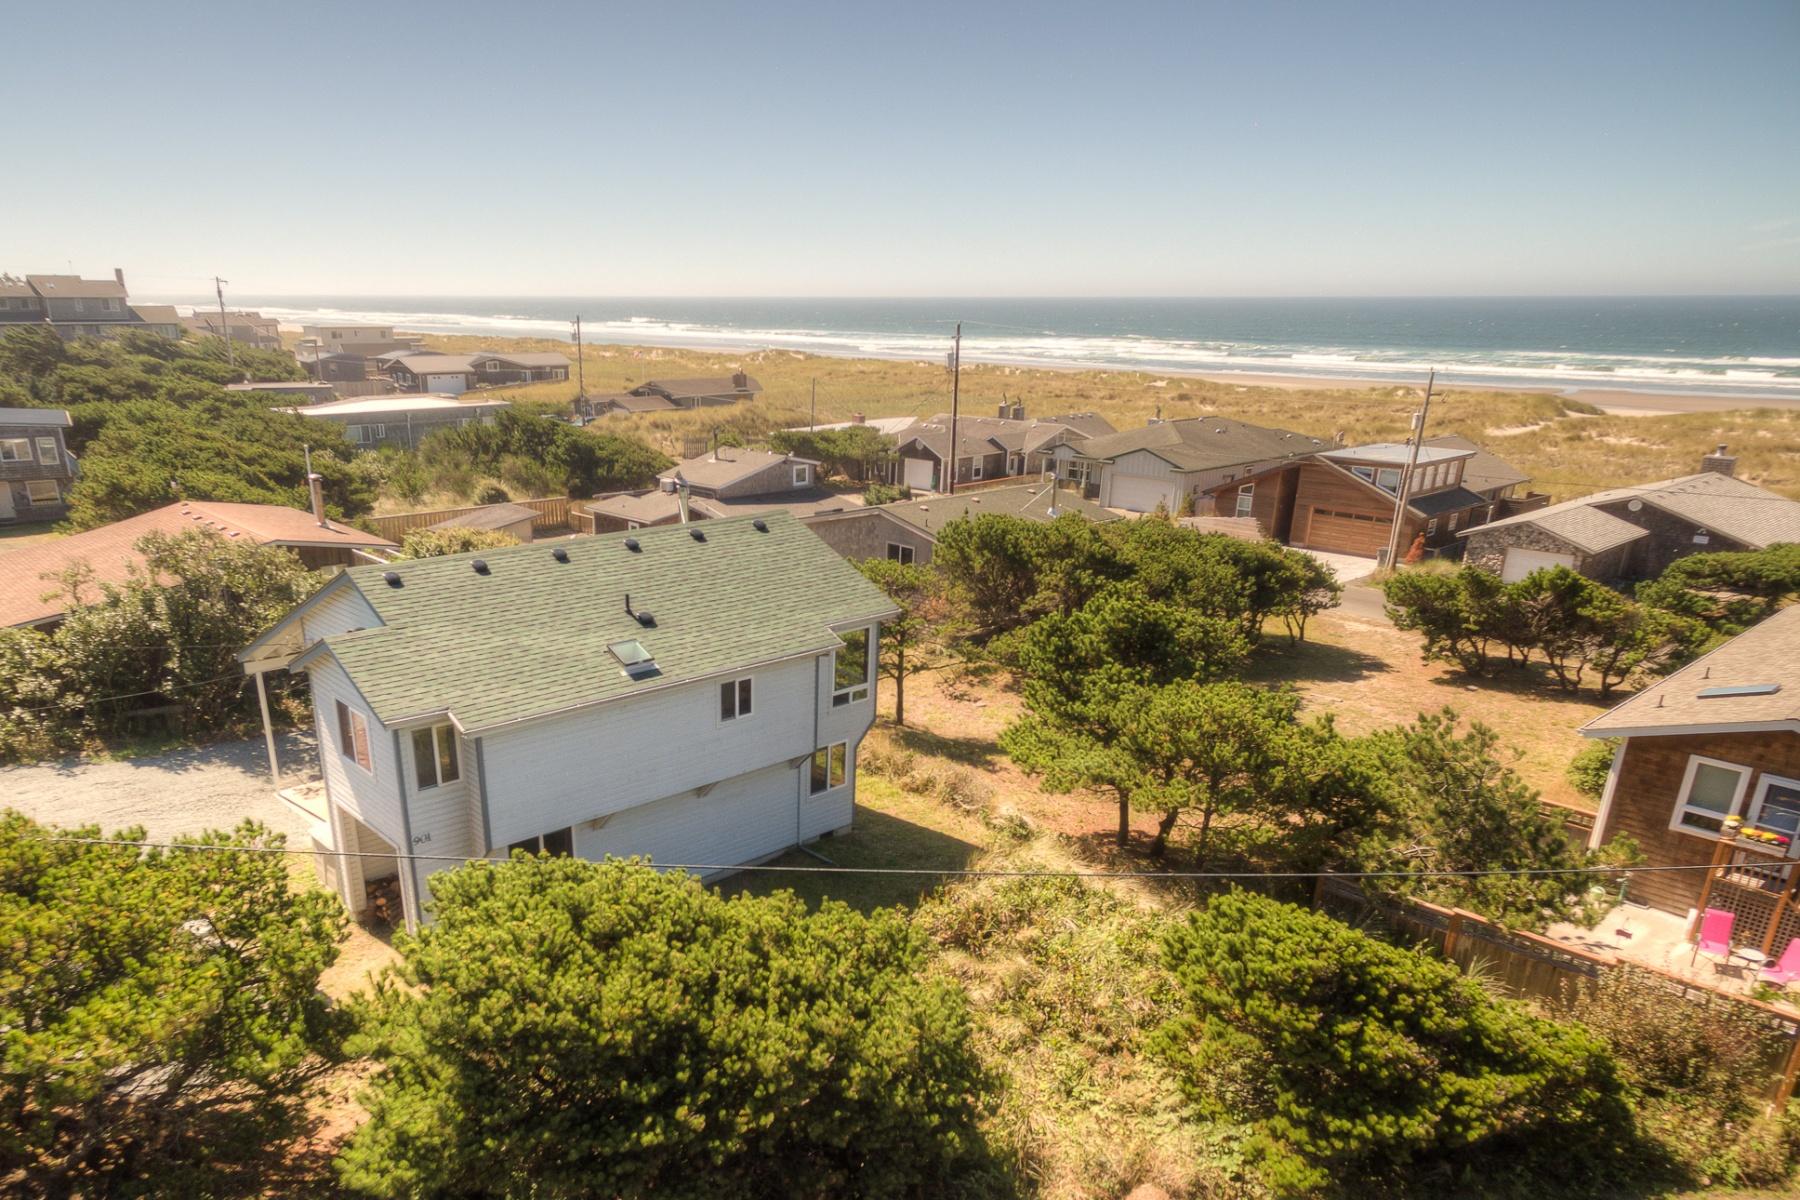 Đất đai vì Bán tại S Beach ST, MANZANITA Manzanita, Oregon, 97130 Hoa Kỳ